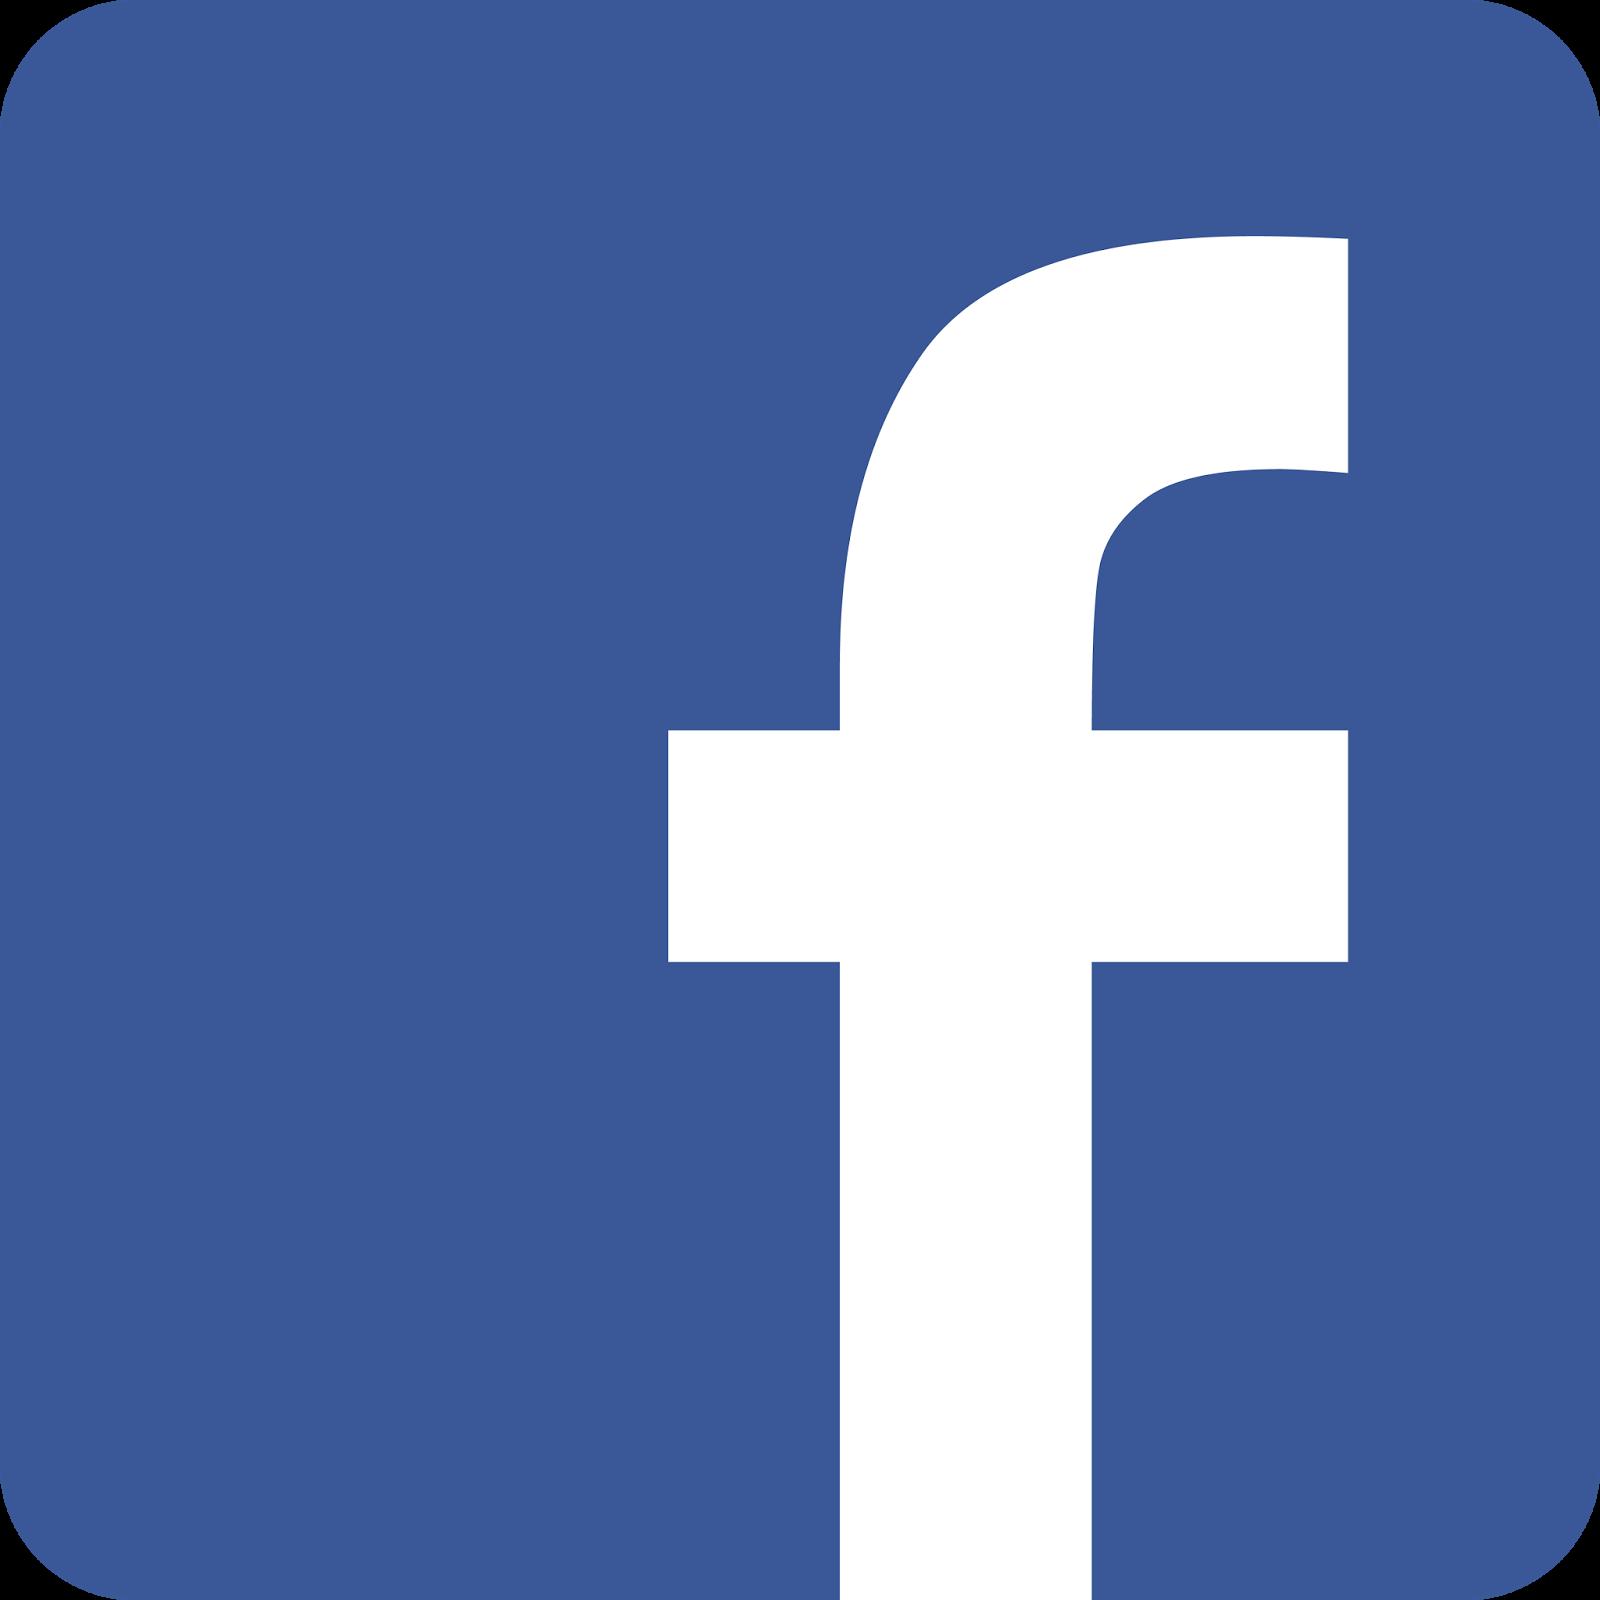 Facebook Logo 493 Free Transparent Png Logos